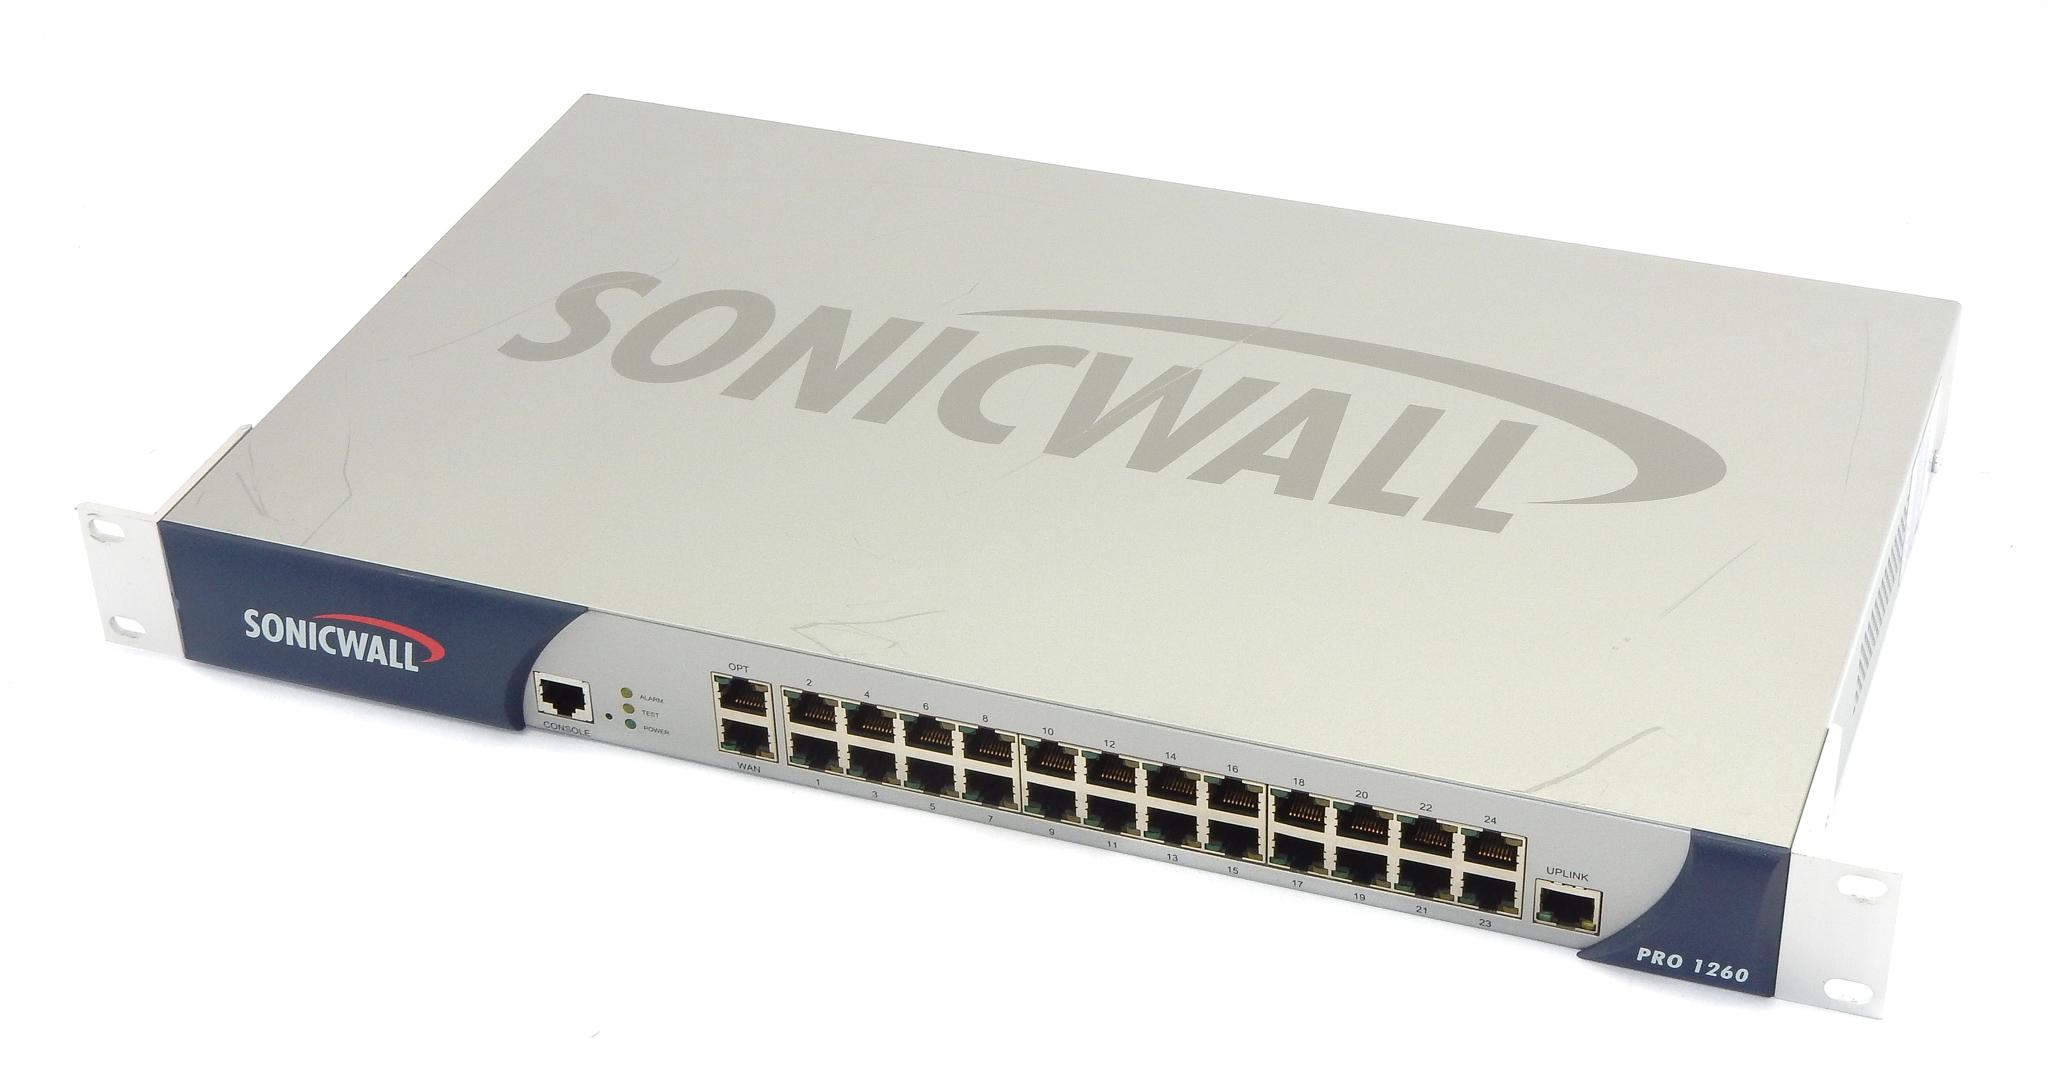 Sonicwall 1RK0C-02F PRO 1260 Enhanced 24-Port Security Appliance